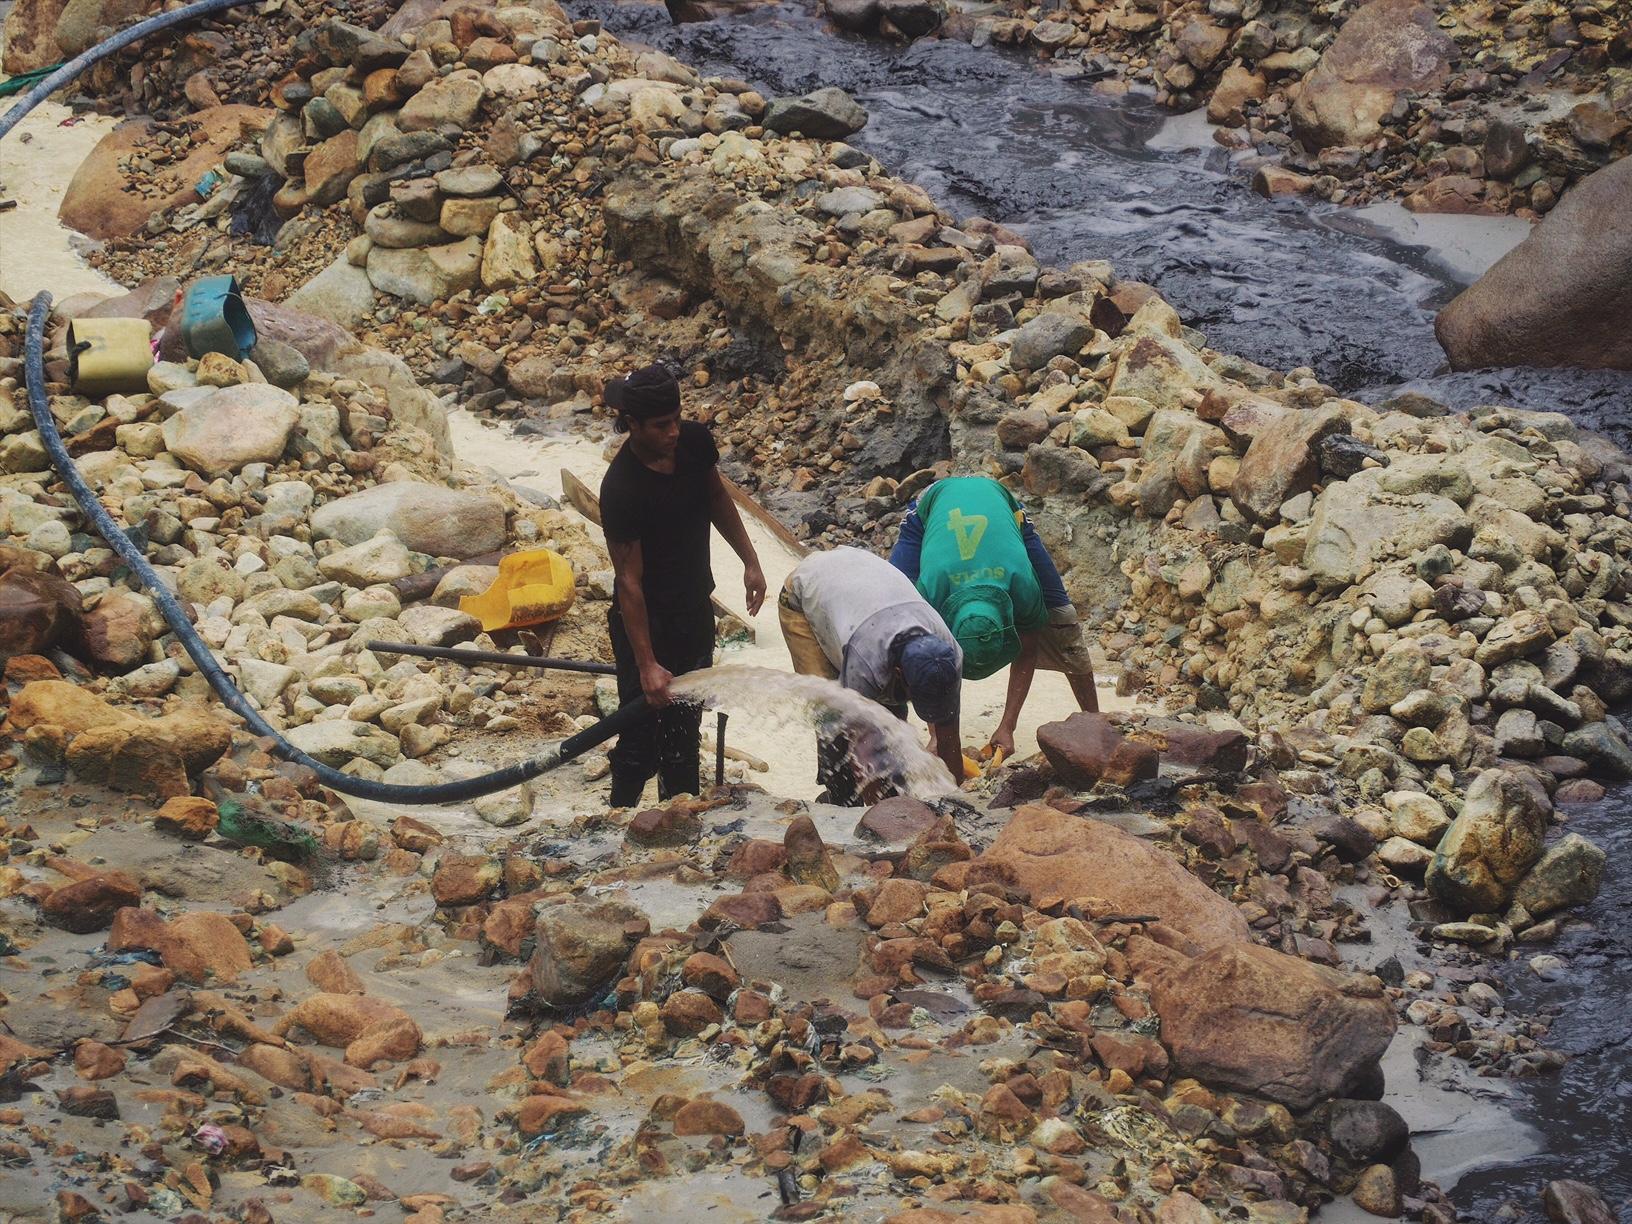 Small mining operation along the Rio Cauca